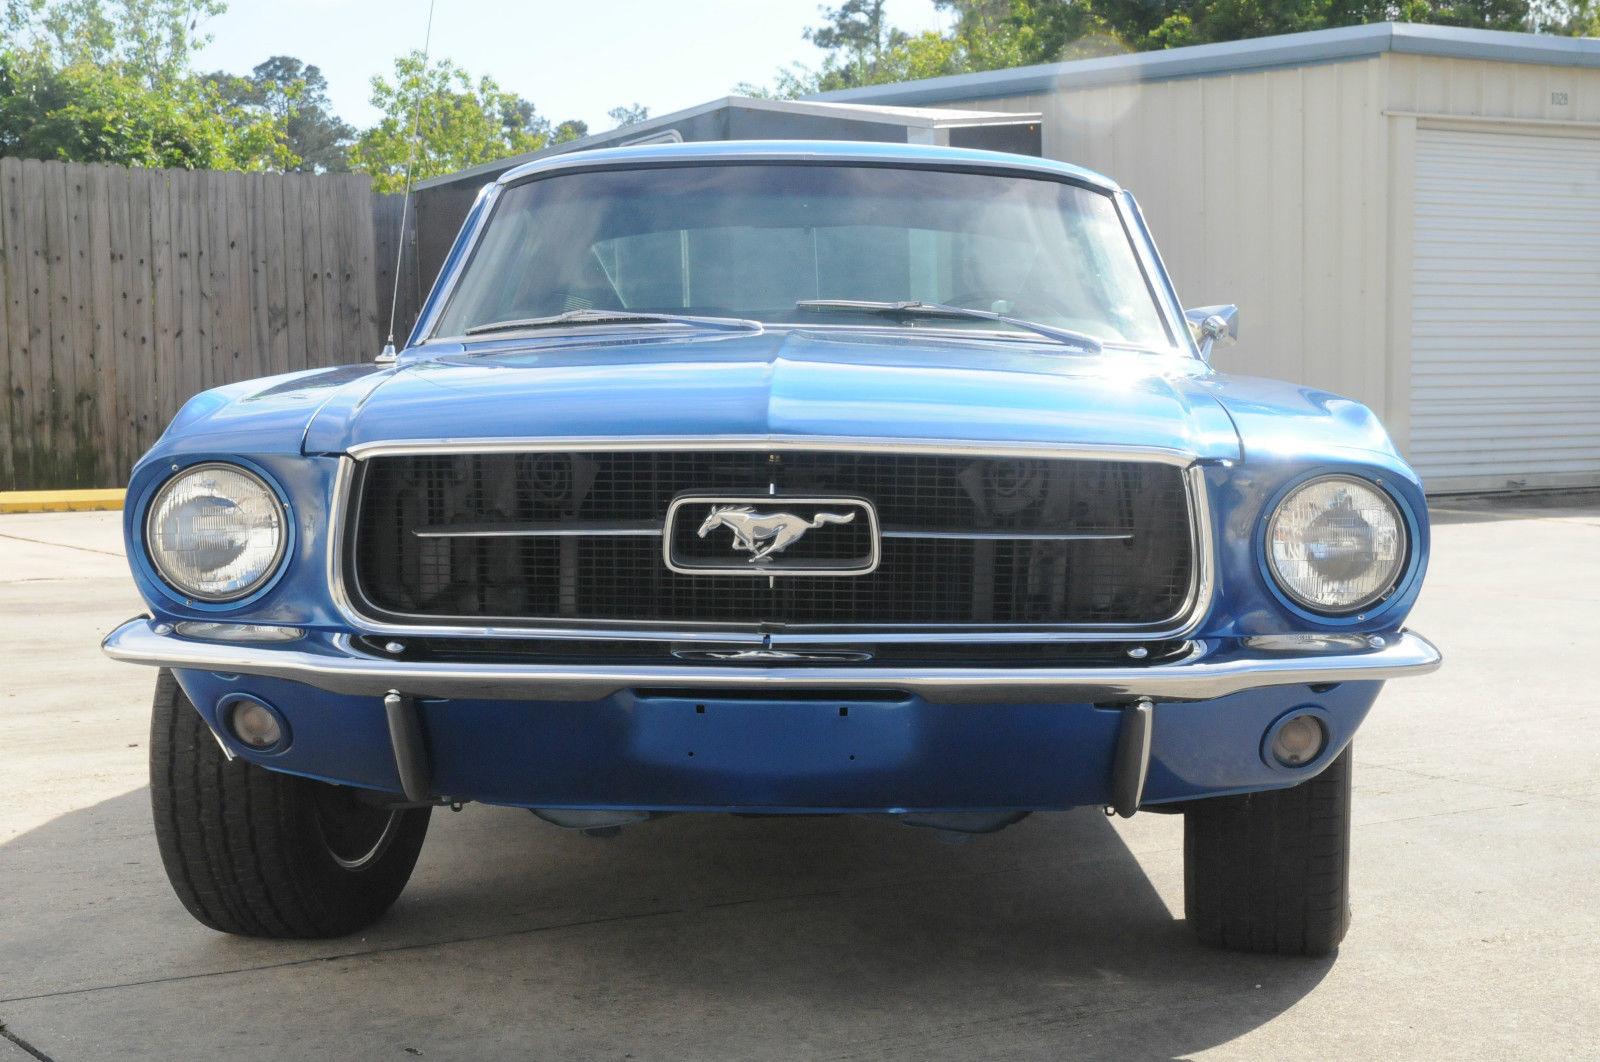 1967 FORD MUSTANG FASTBACK - 183947  1967 Ford Mustang Fastback Blue